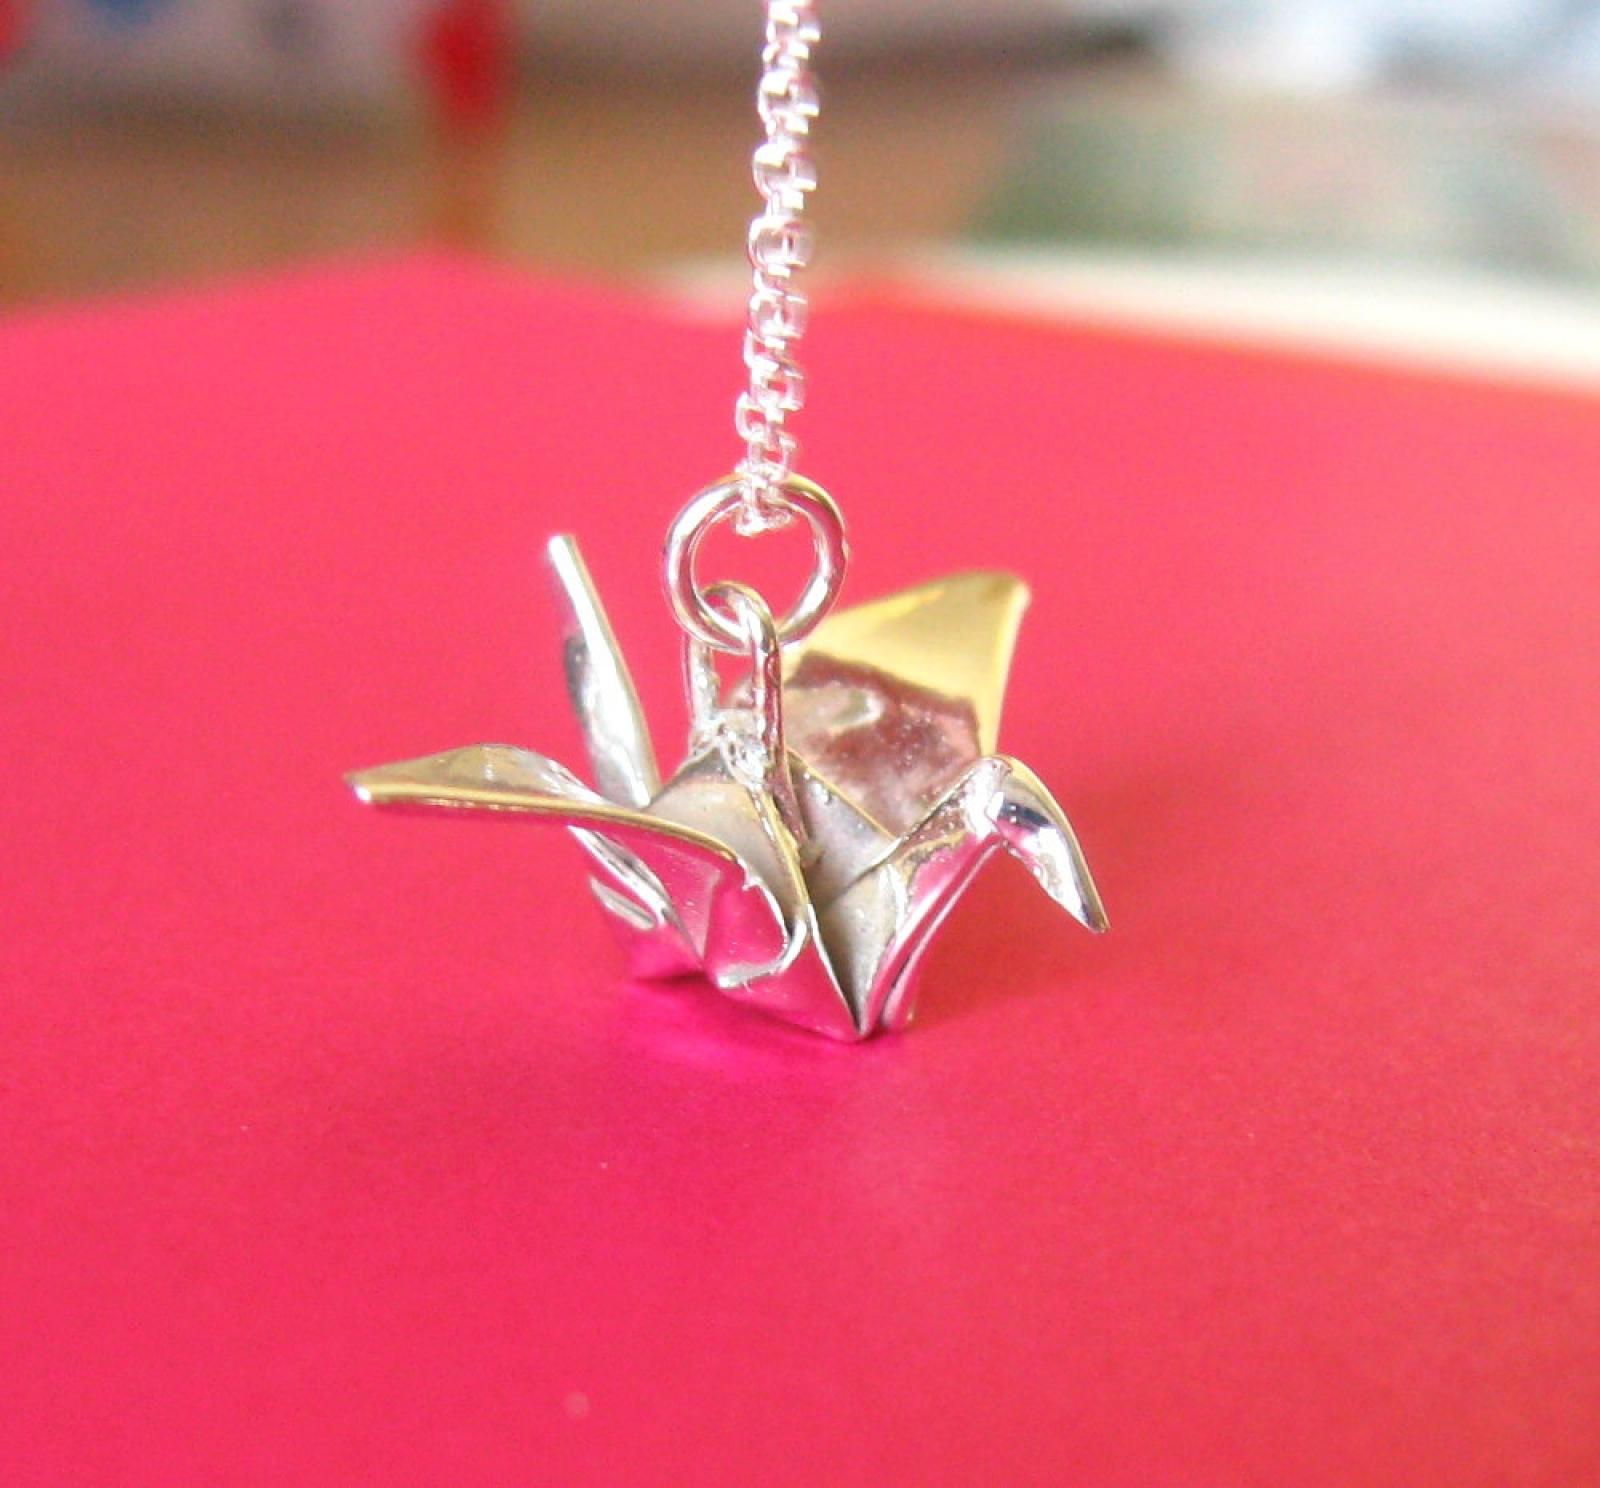 Silver origami crane pendant allegro arts crane pendant aloadofball Images